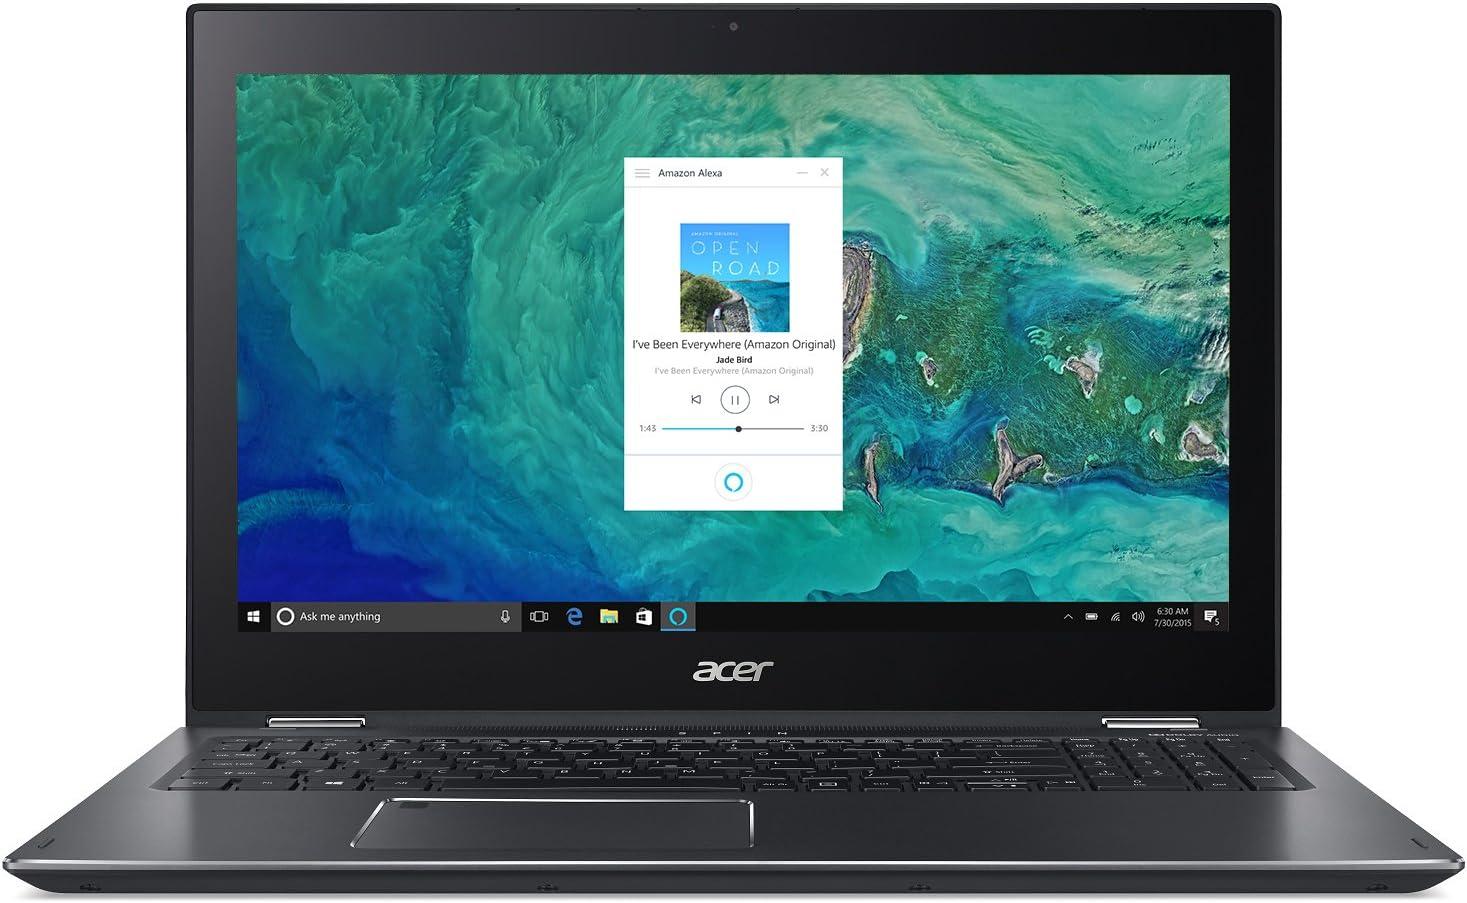 Best 2 in 1 laptop under $1000-Acer Spin 5